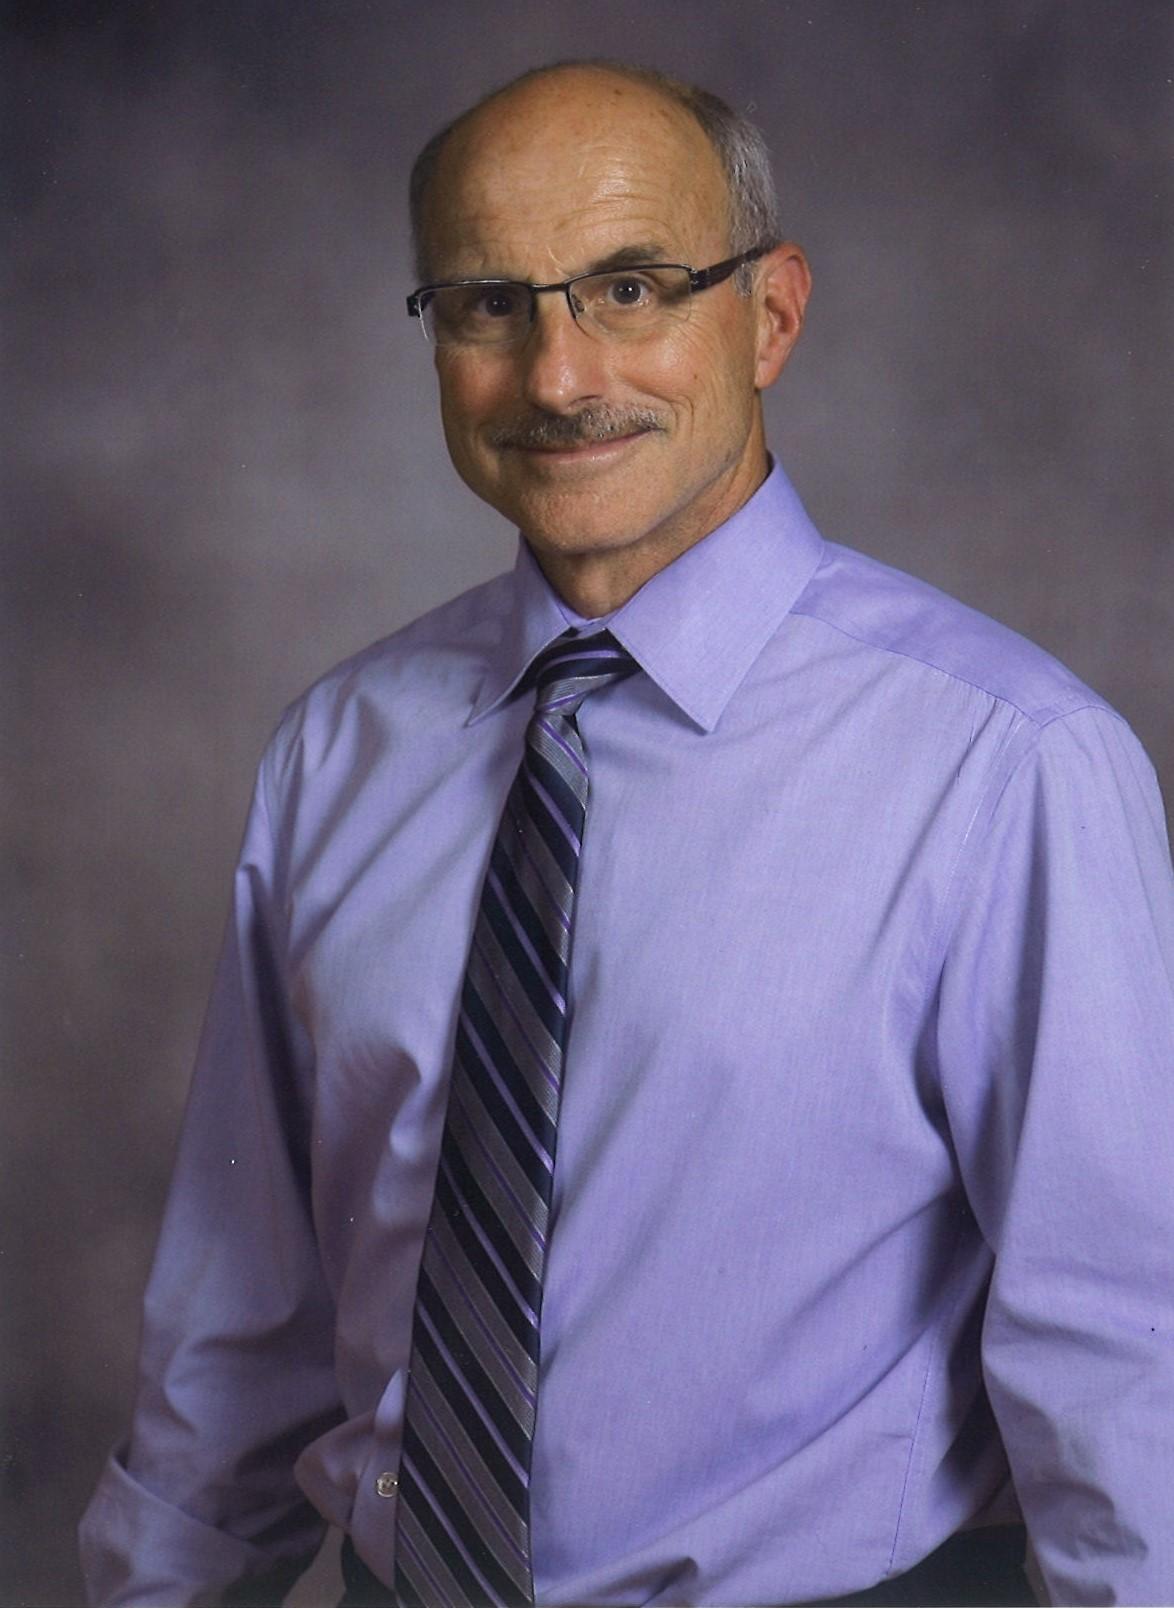 Jim Kafer